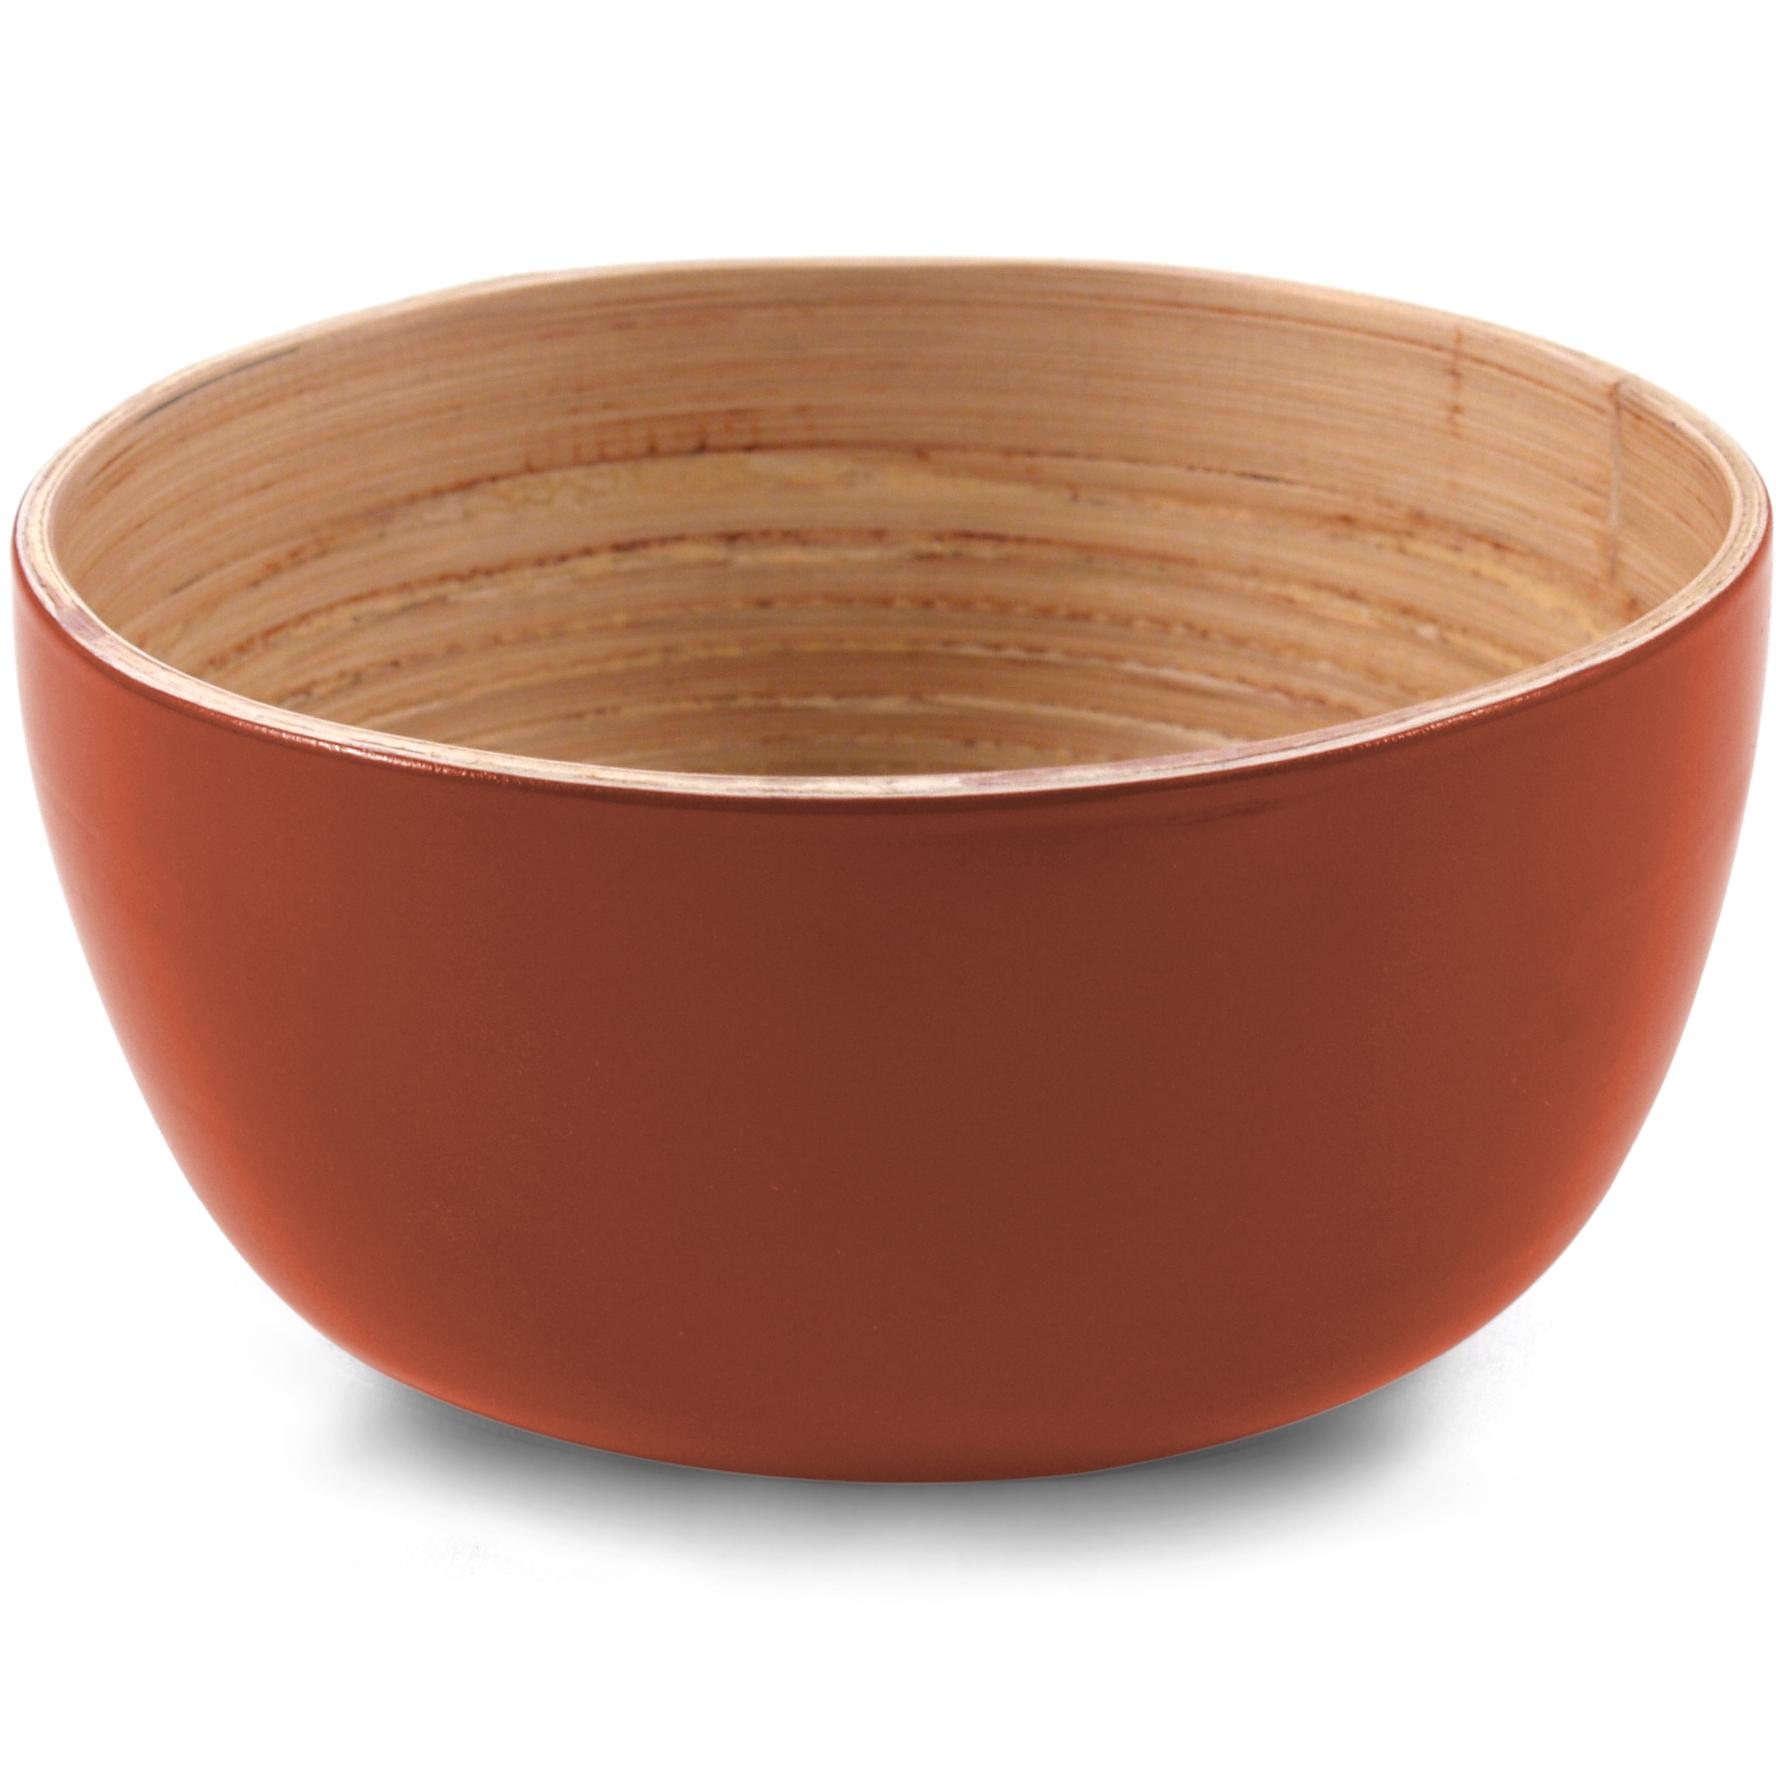 Core Bamboo Terracotta Orange Small Bowl, Set of 4